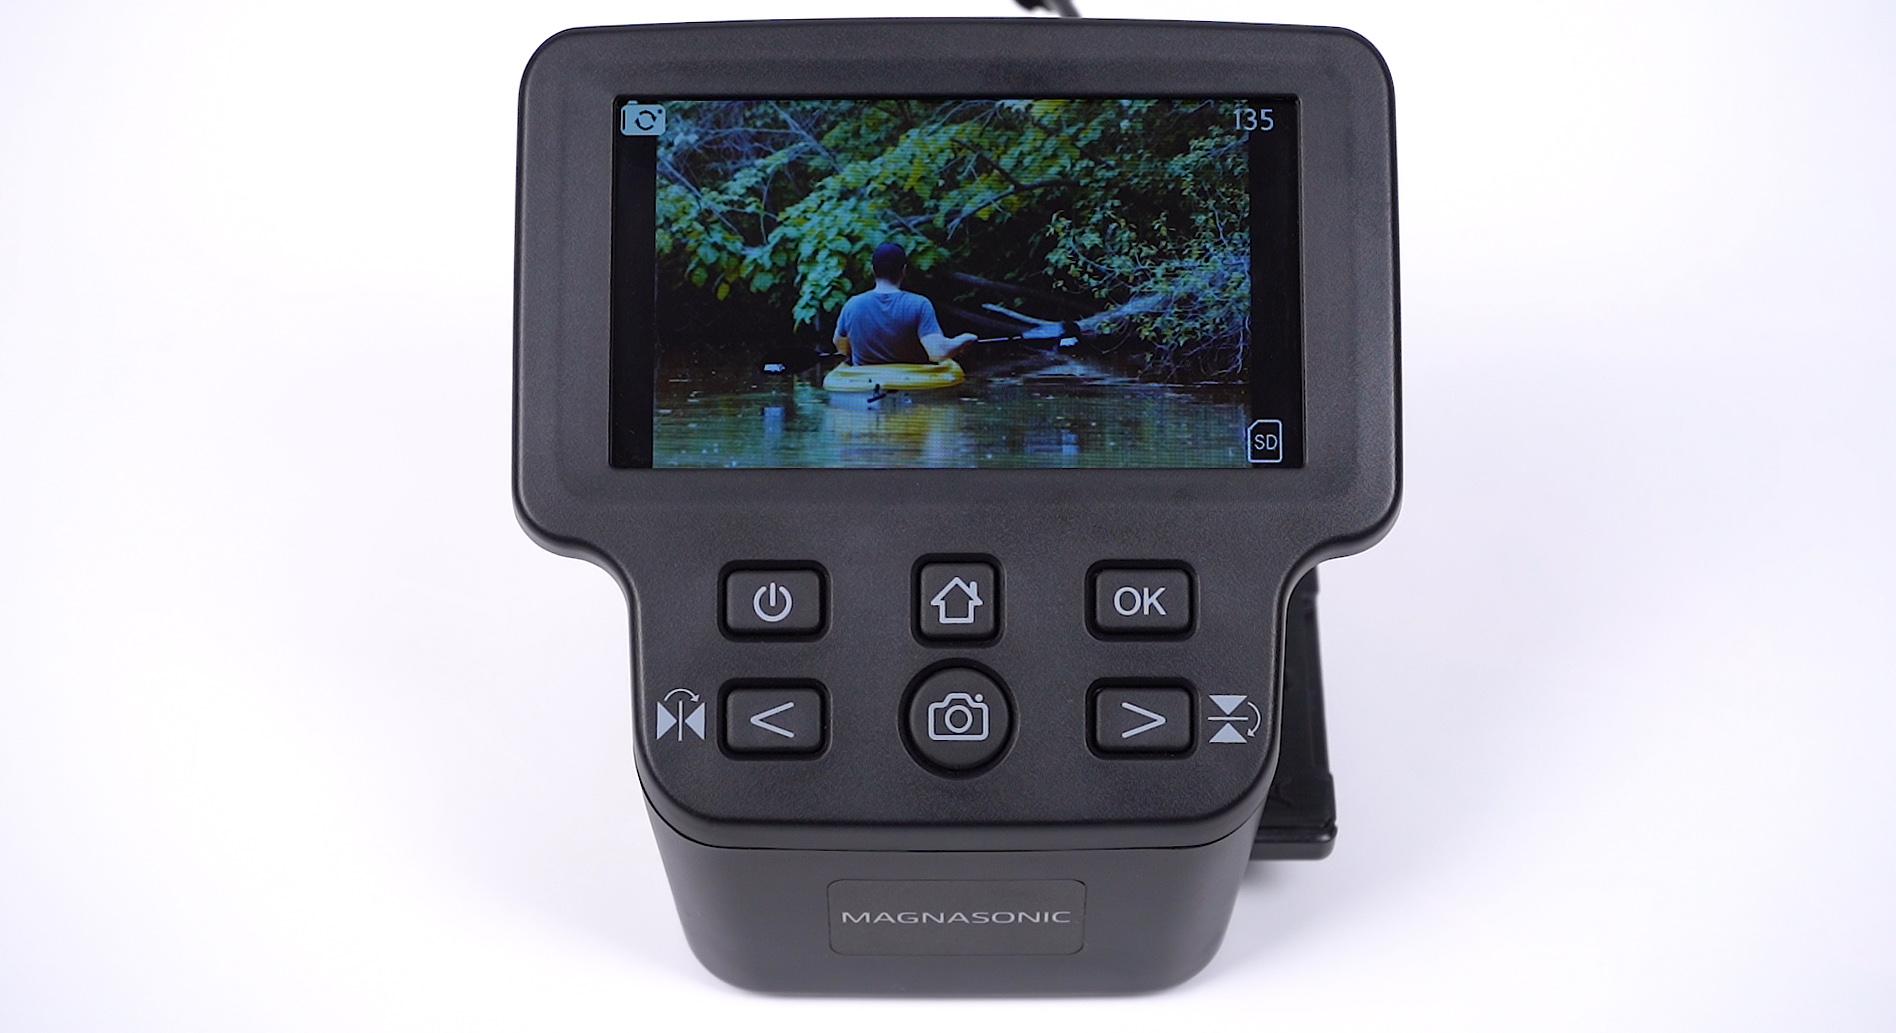 Magnasonic FS71 22MP Film Scanner